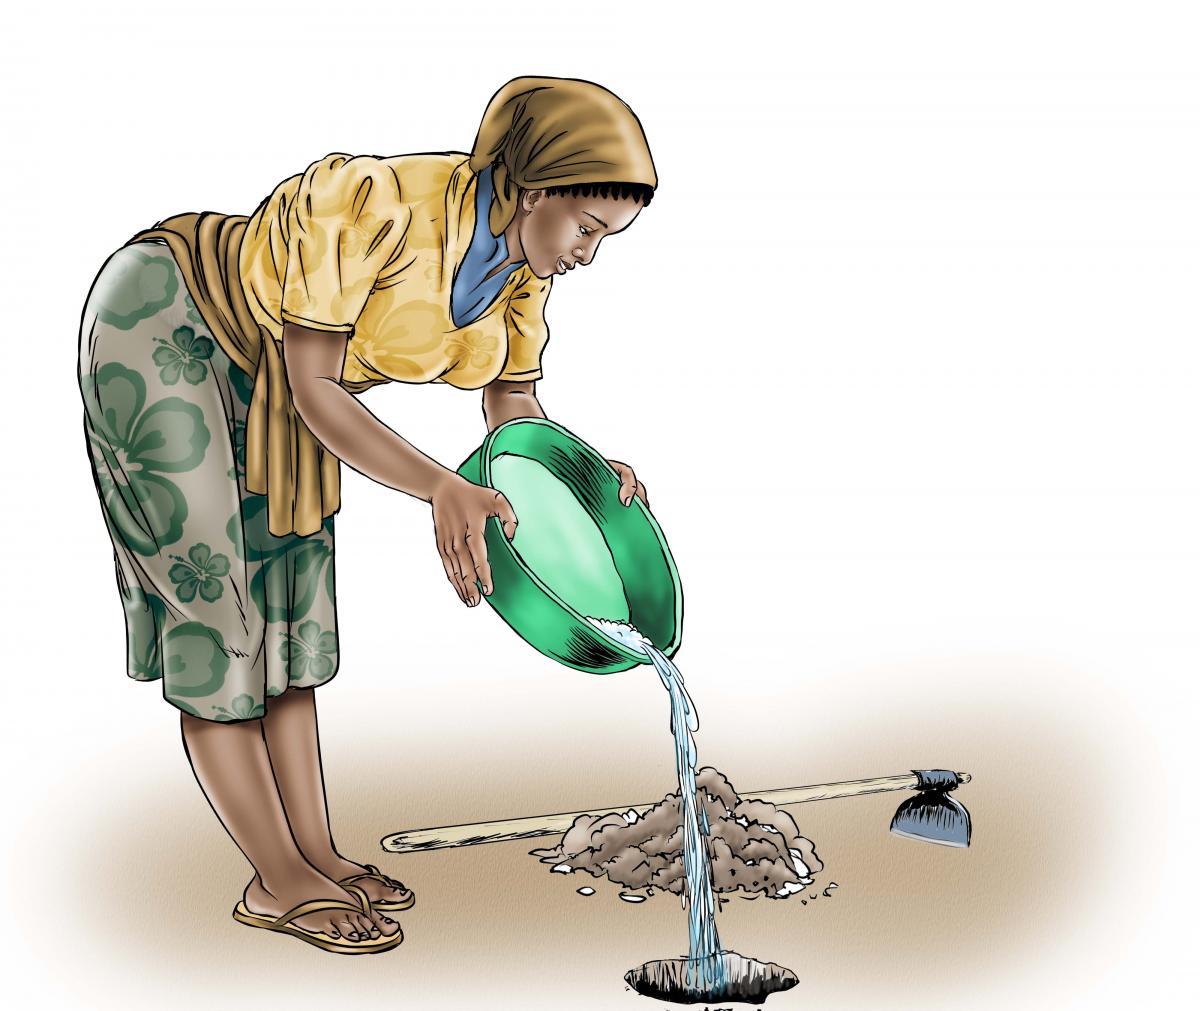 Sanitation - Depositing waste in hole - 03A - Sierra Leone